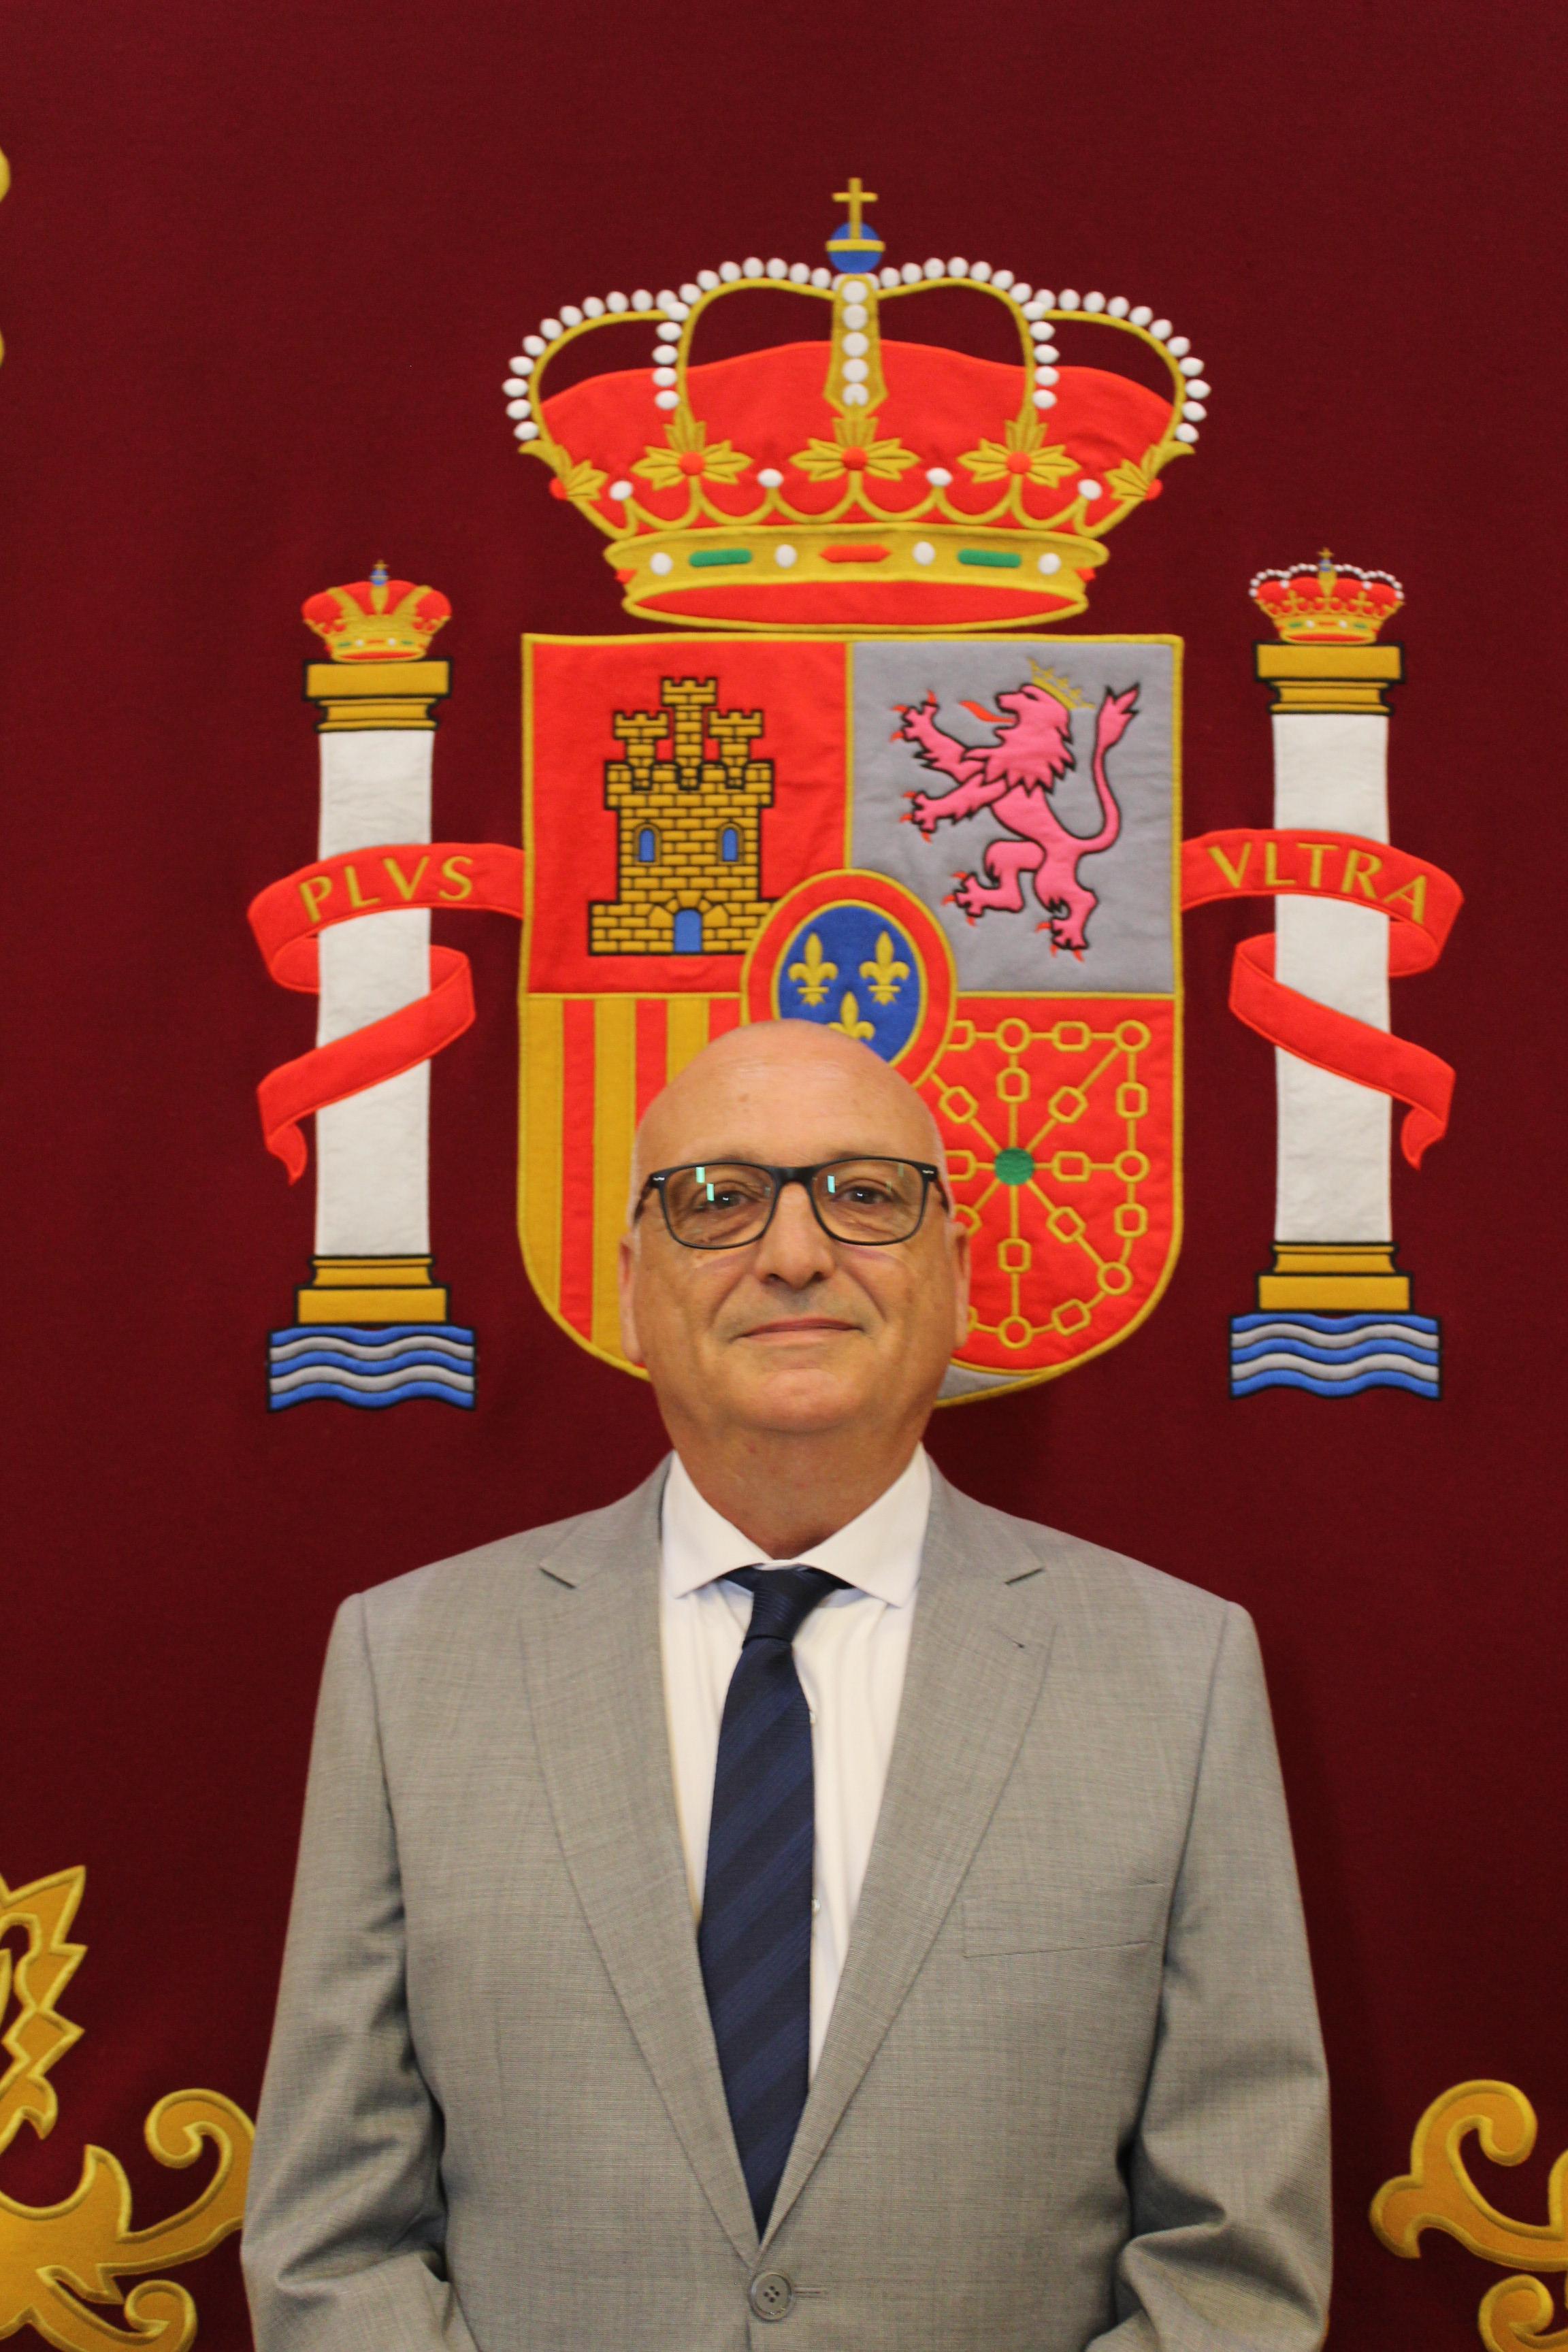 10. Pablo Francisco Montesinos Cabello PP